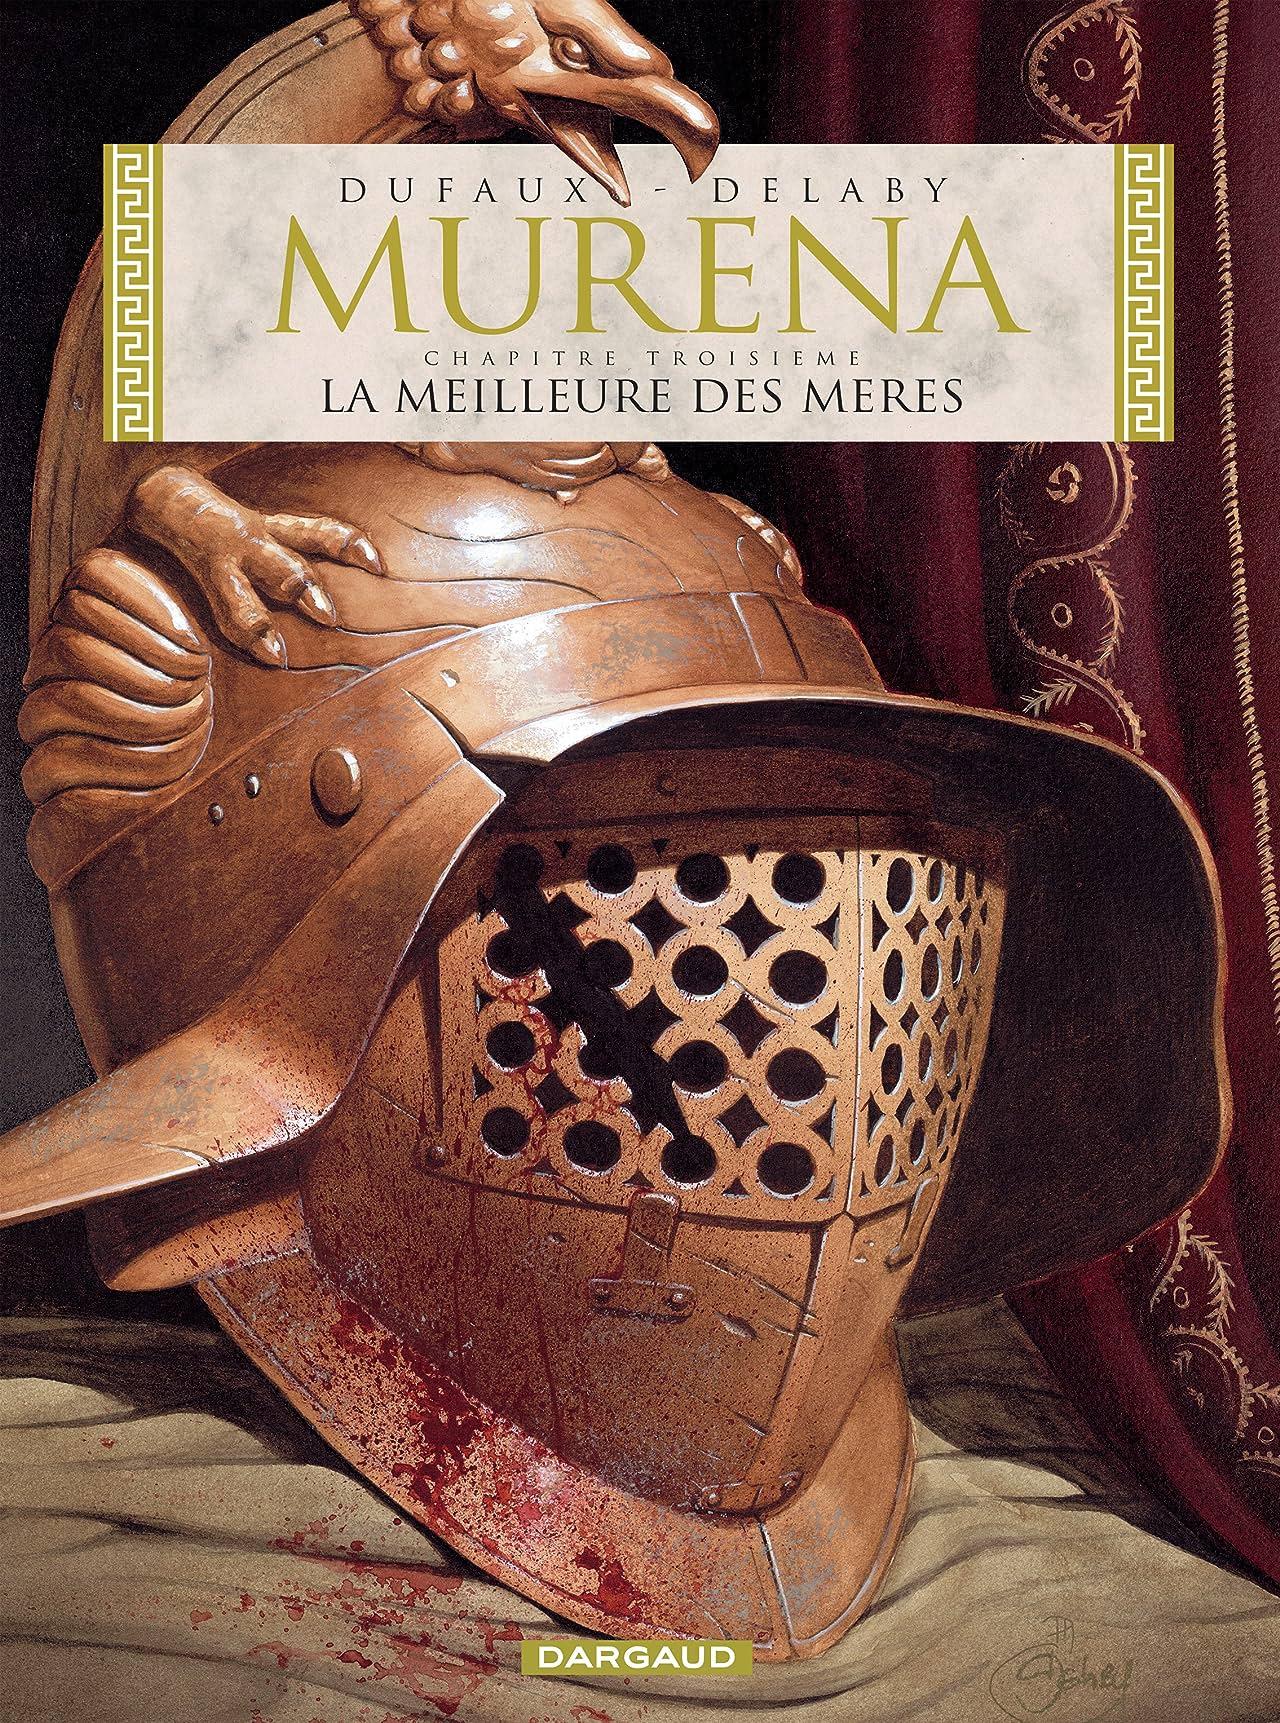 Murena Vol. 3: La Meilleure des mères